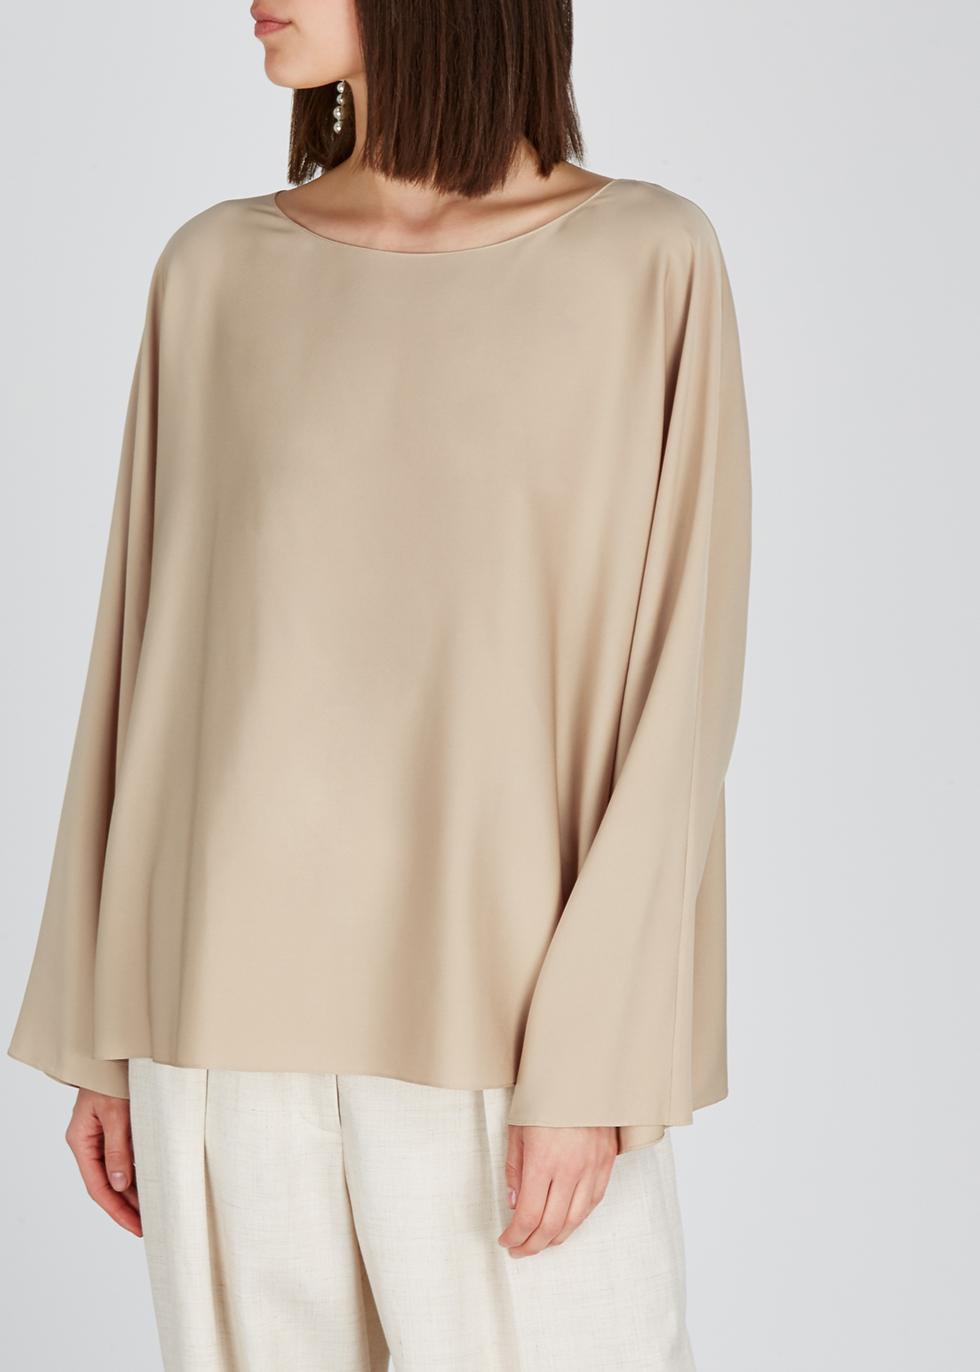 Dylia sand stretch-silk top - THE ROW